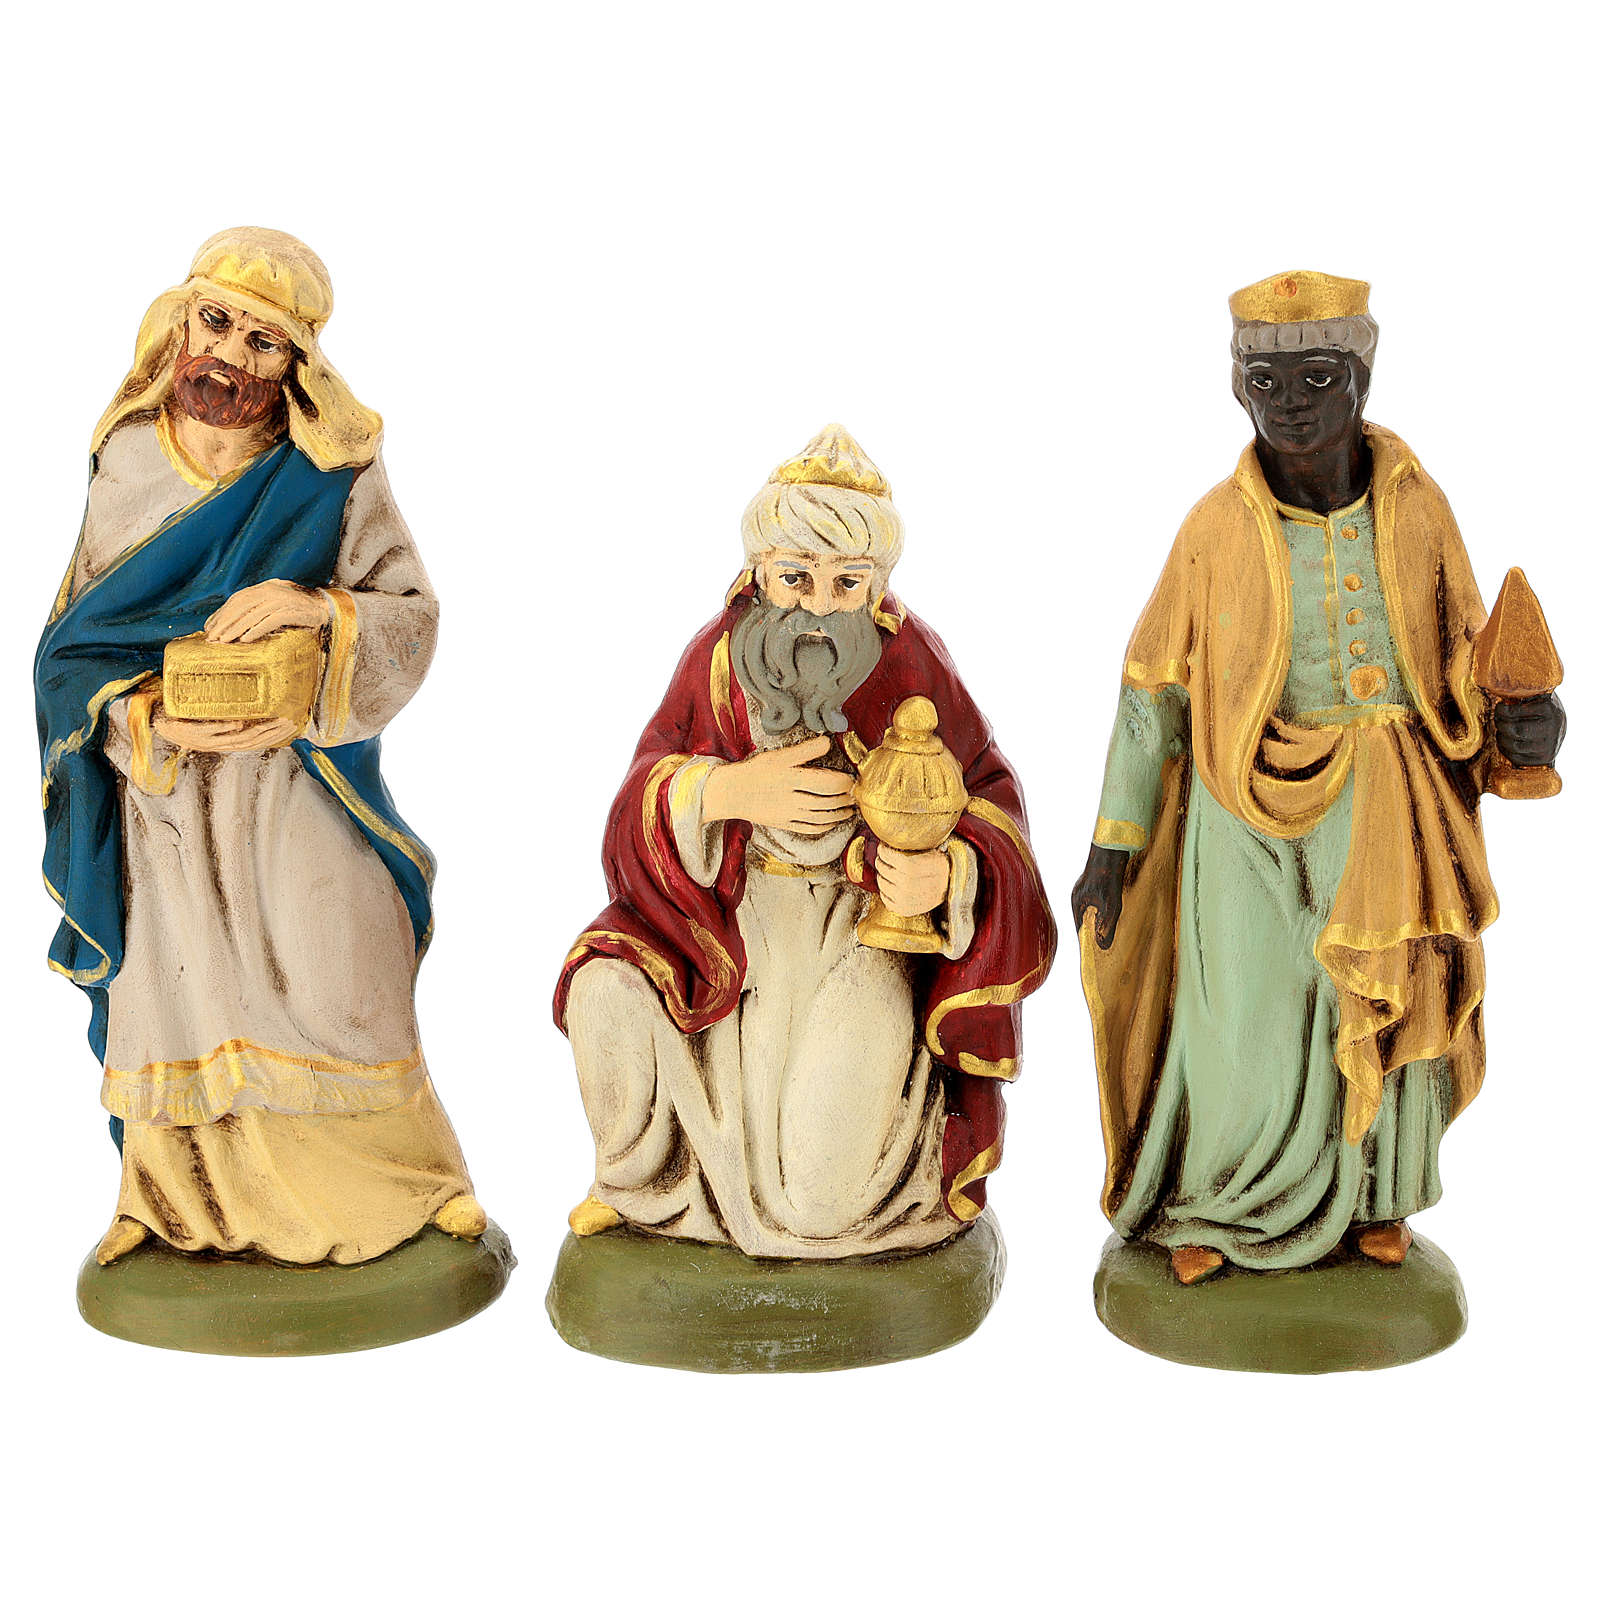 Presepe terracotta dipinta 15 statuine 20 cm 4